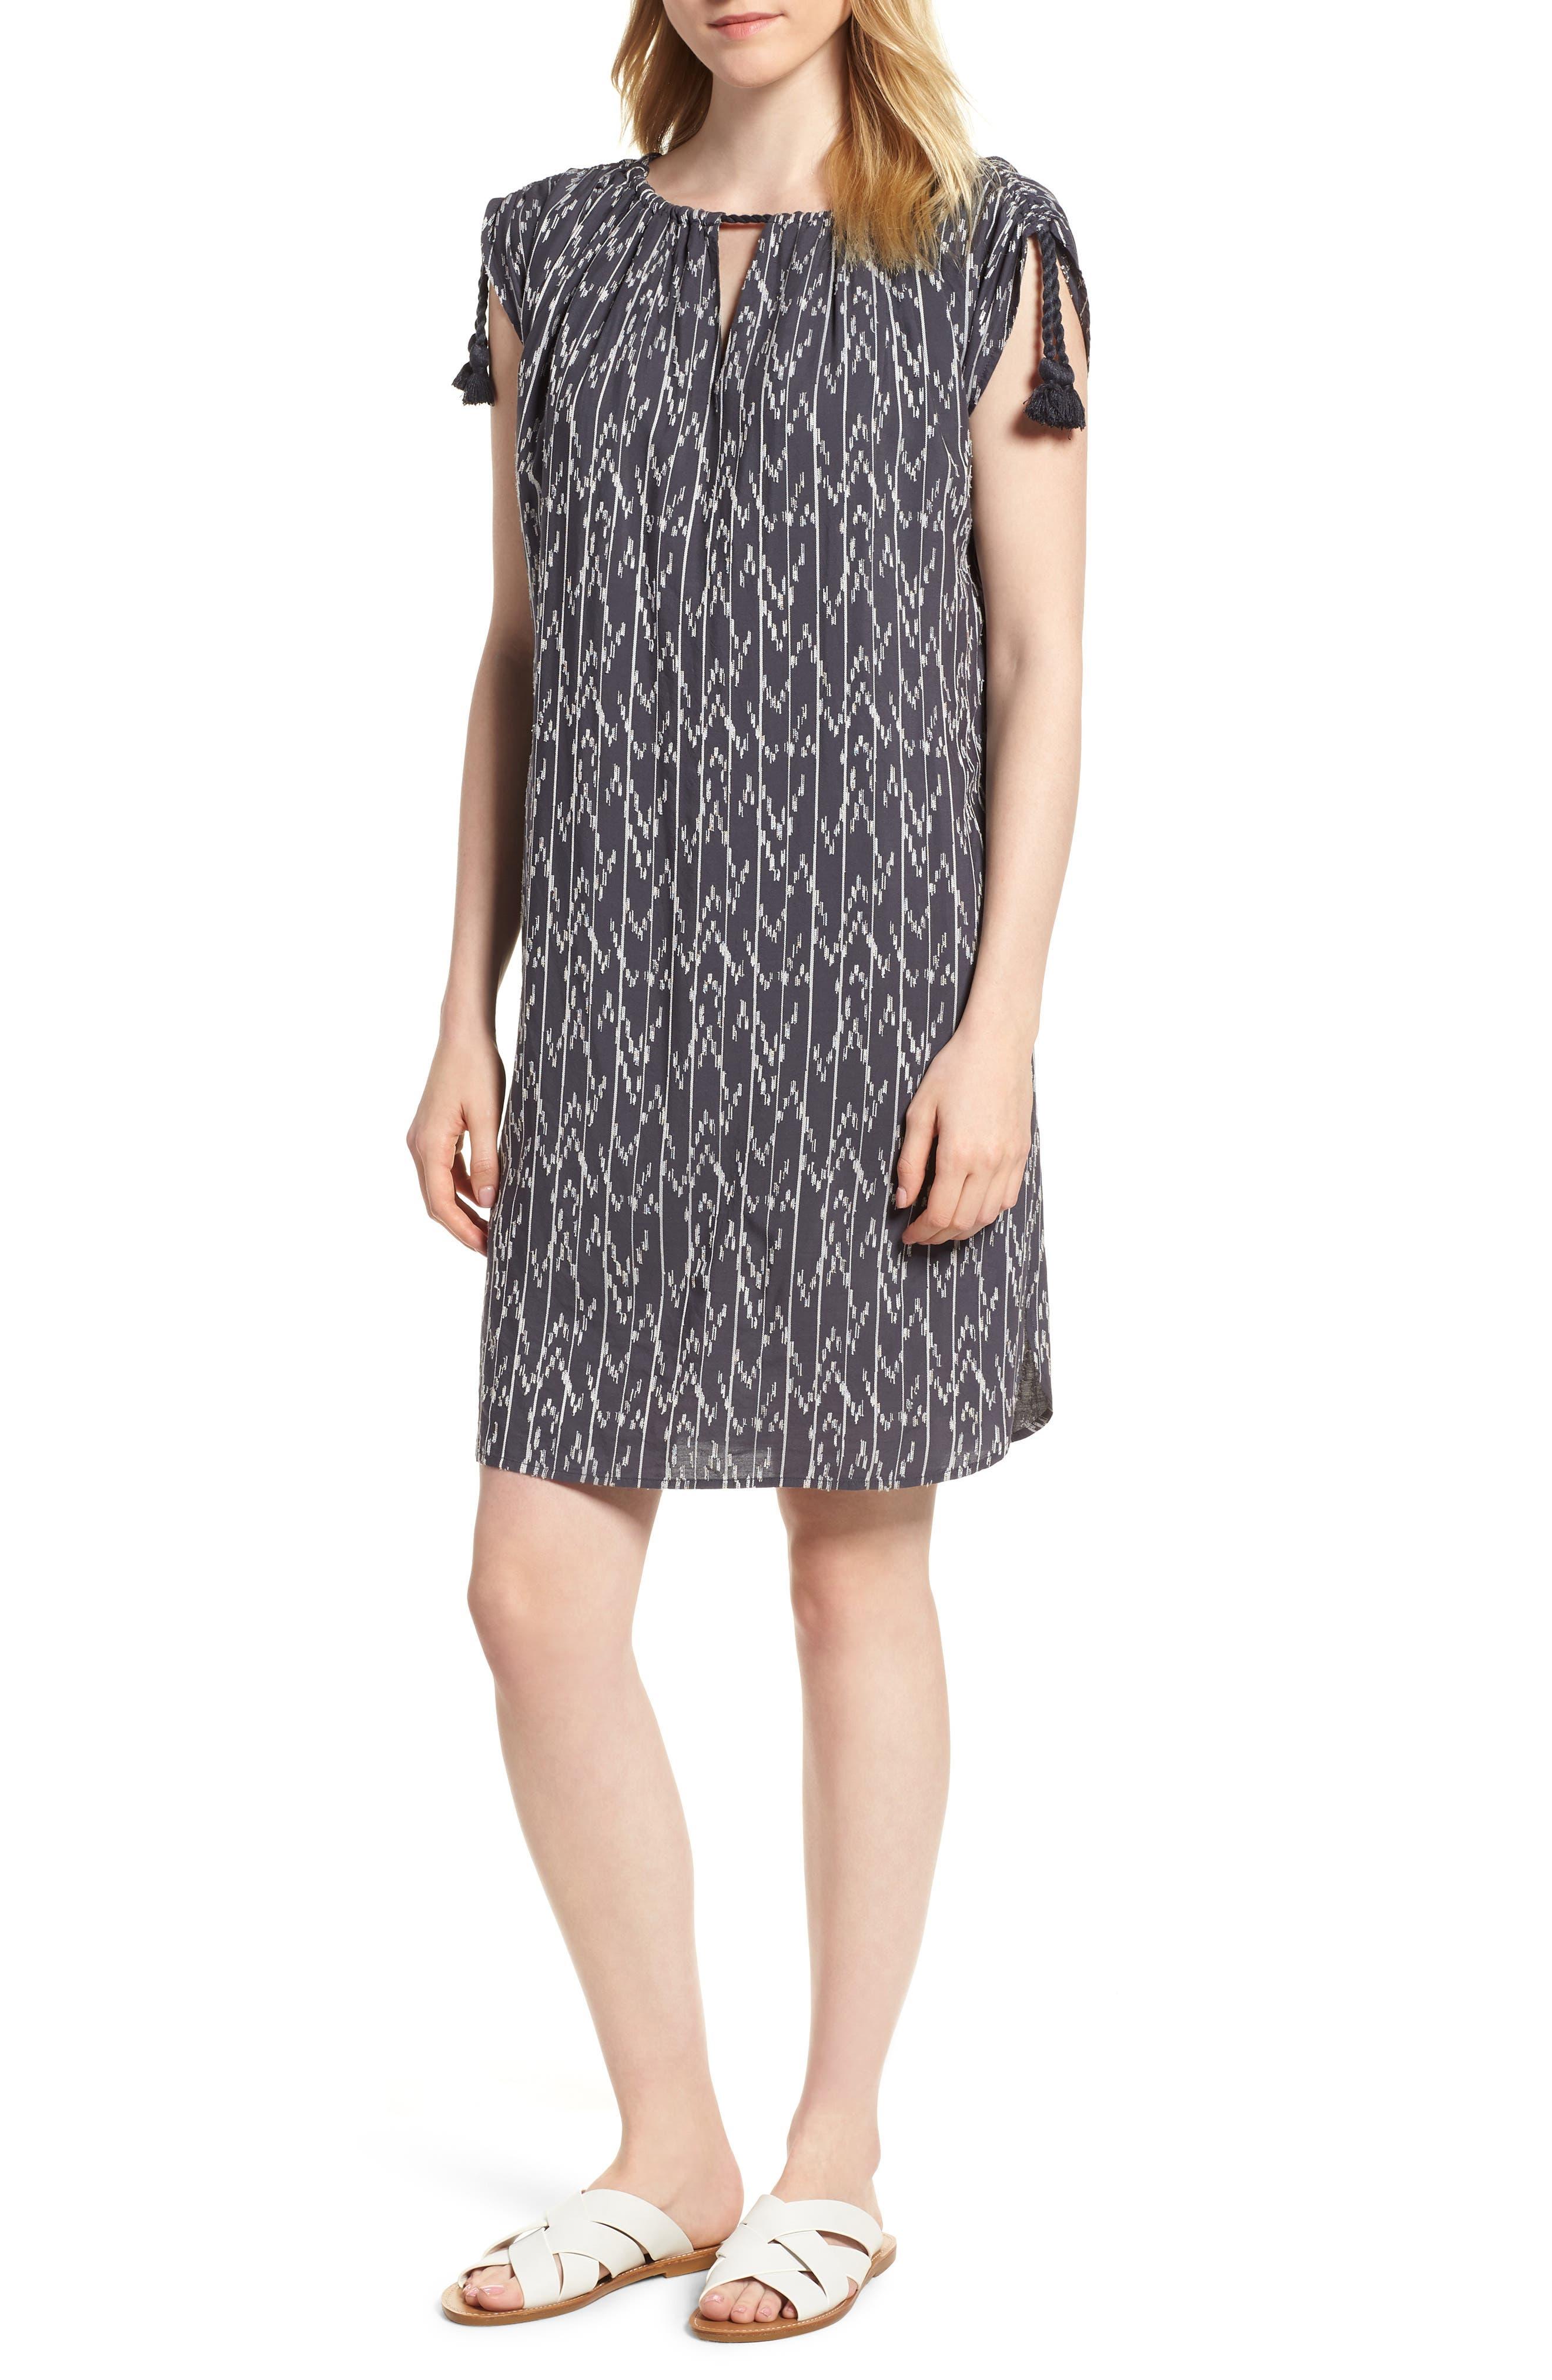 Market Embroidered Shirt Dress,                             Main thumbnail 1, color,                             Multi